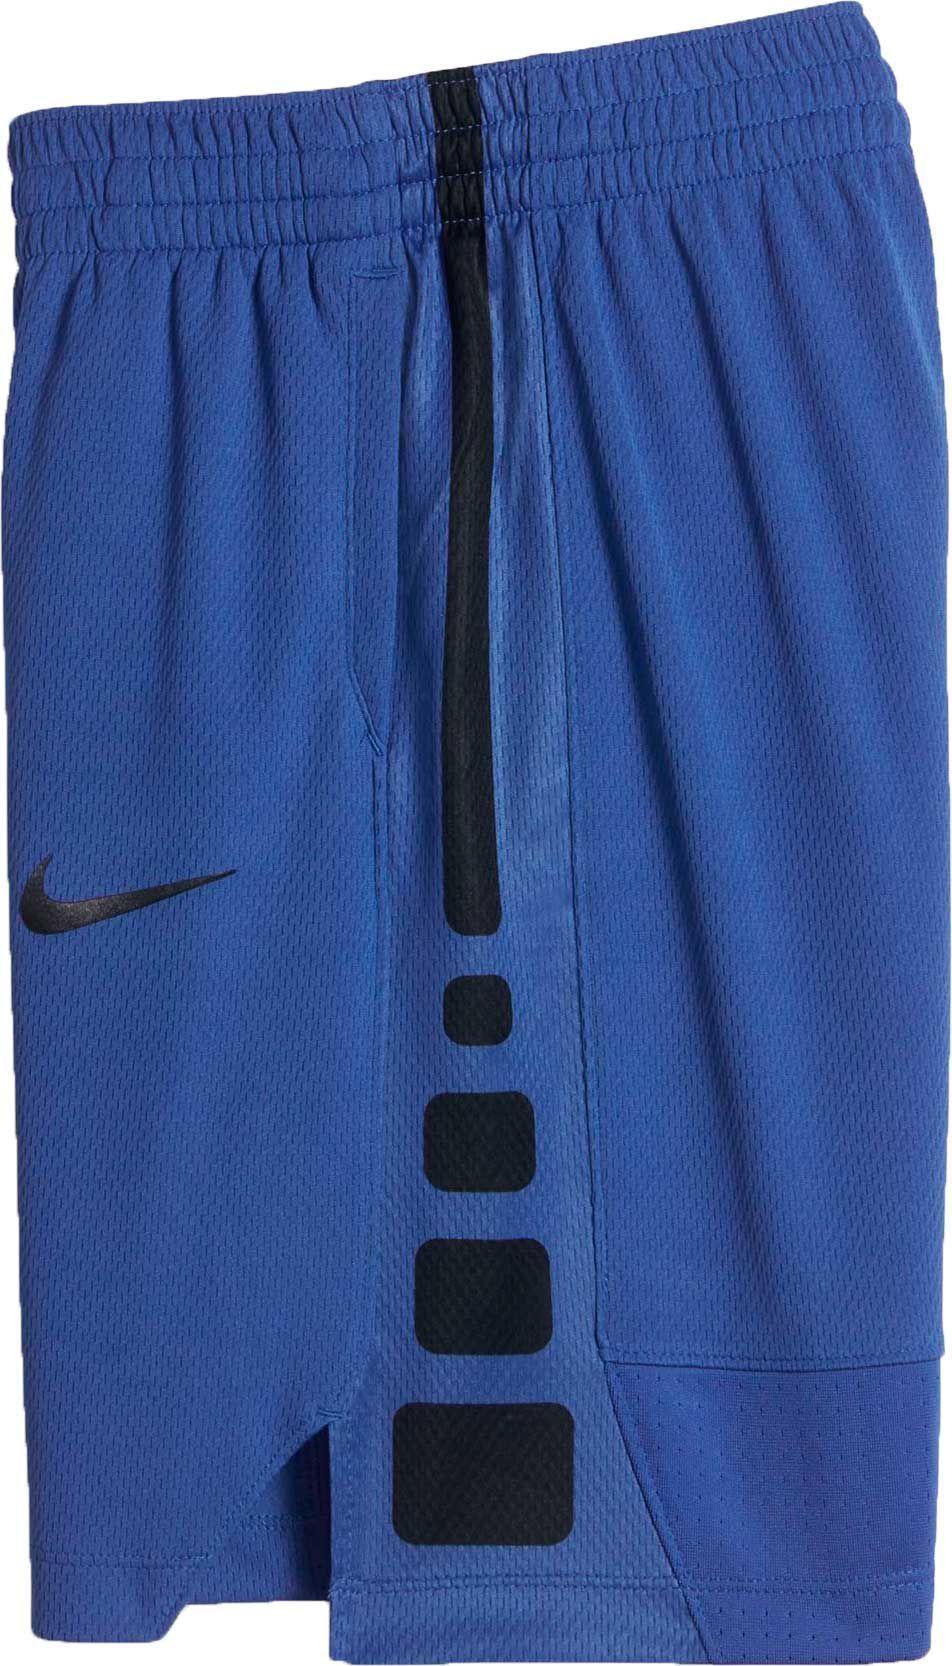 Nike Boys Dry Elite Stripe Basketball Shorts Size Medium Blue Basketball Shorts Elite Shorts Shorts